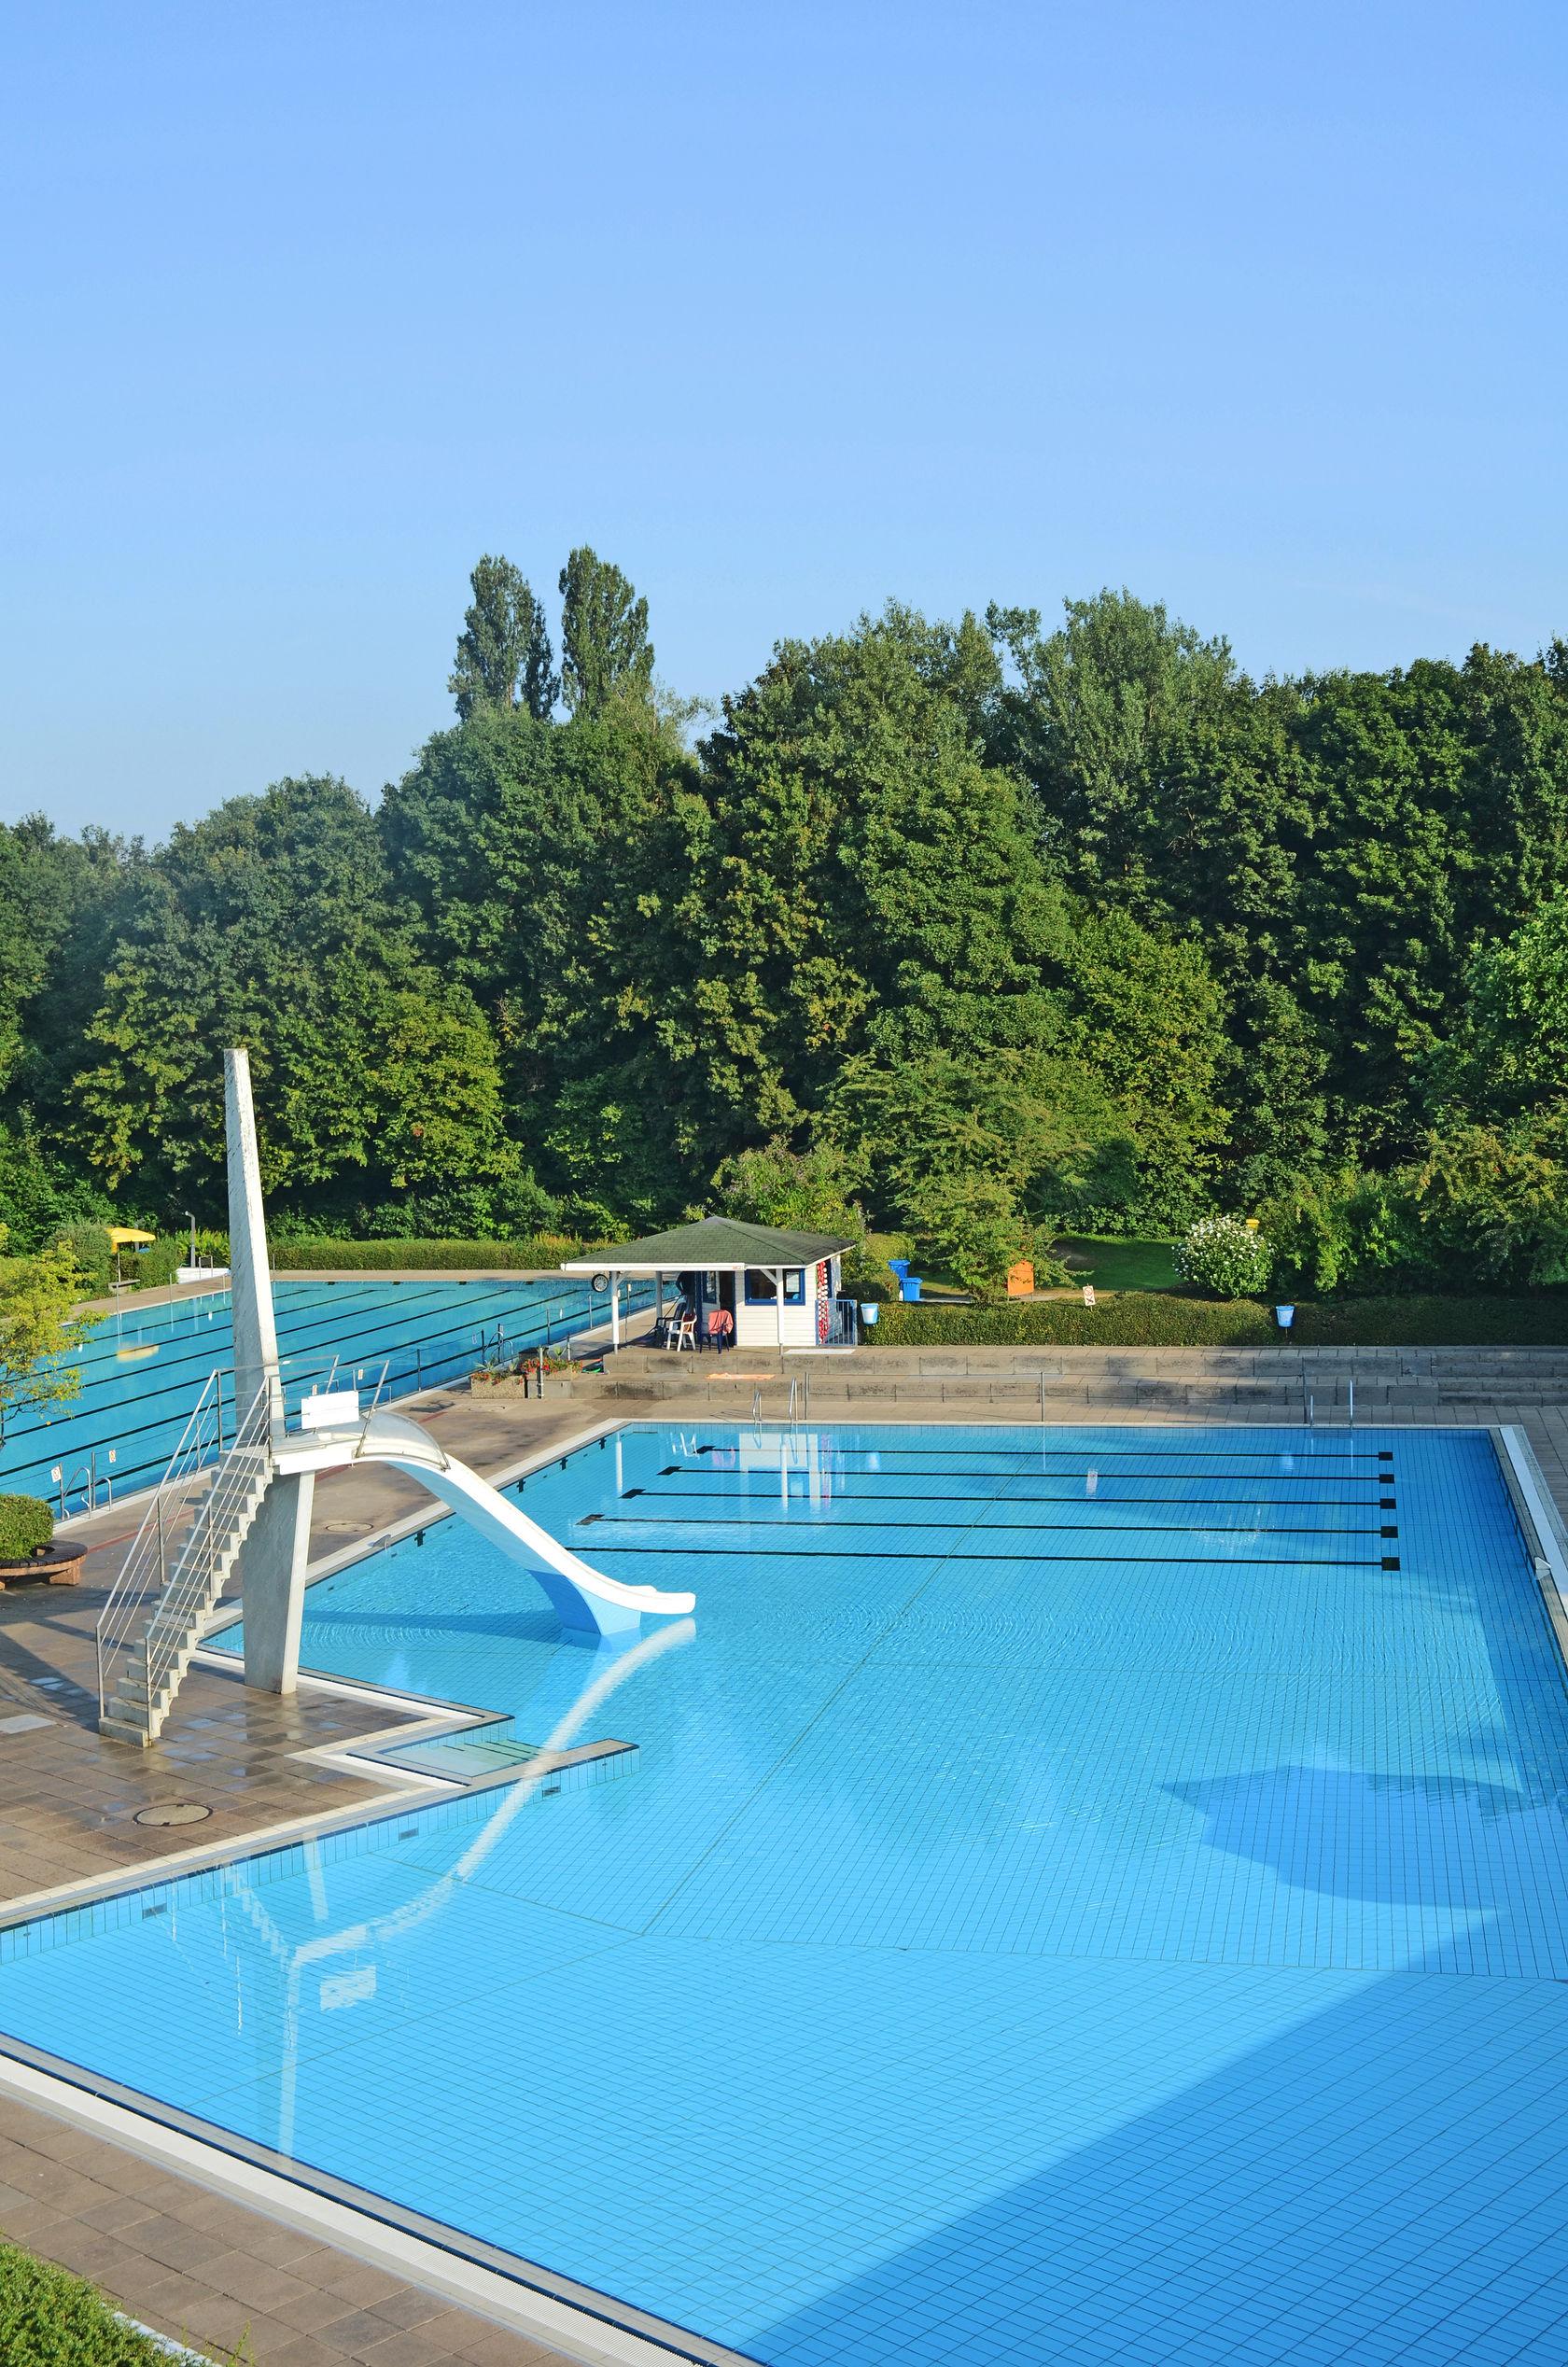 Kehl stadtr te heben badeshort verbot in kehler freib dern for Piscine offenburg